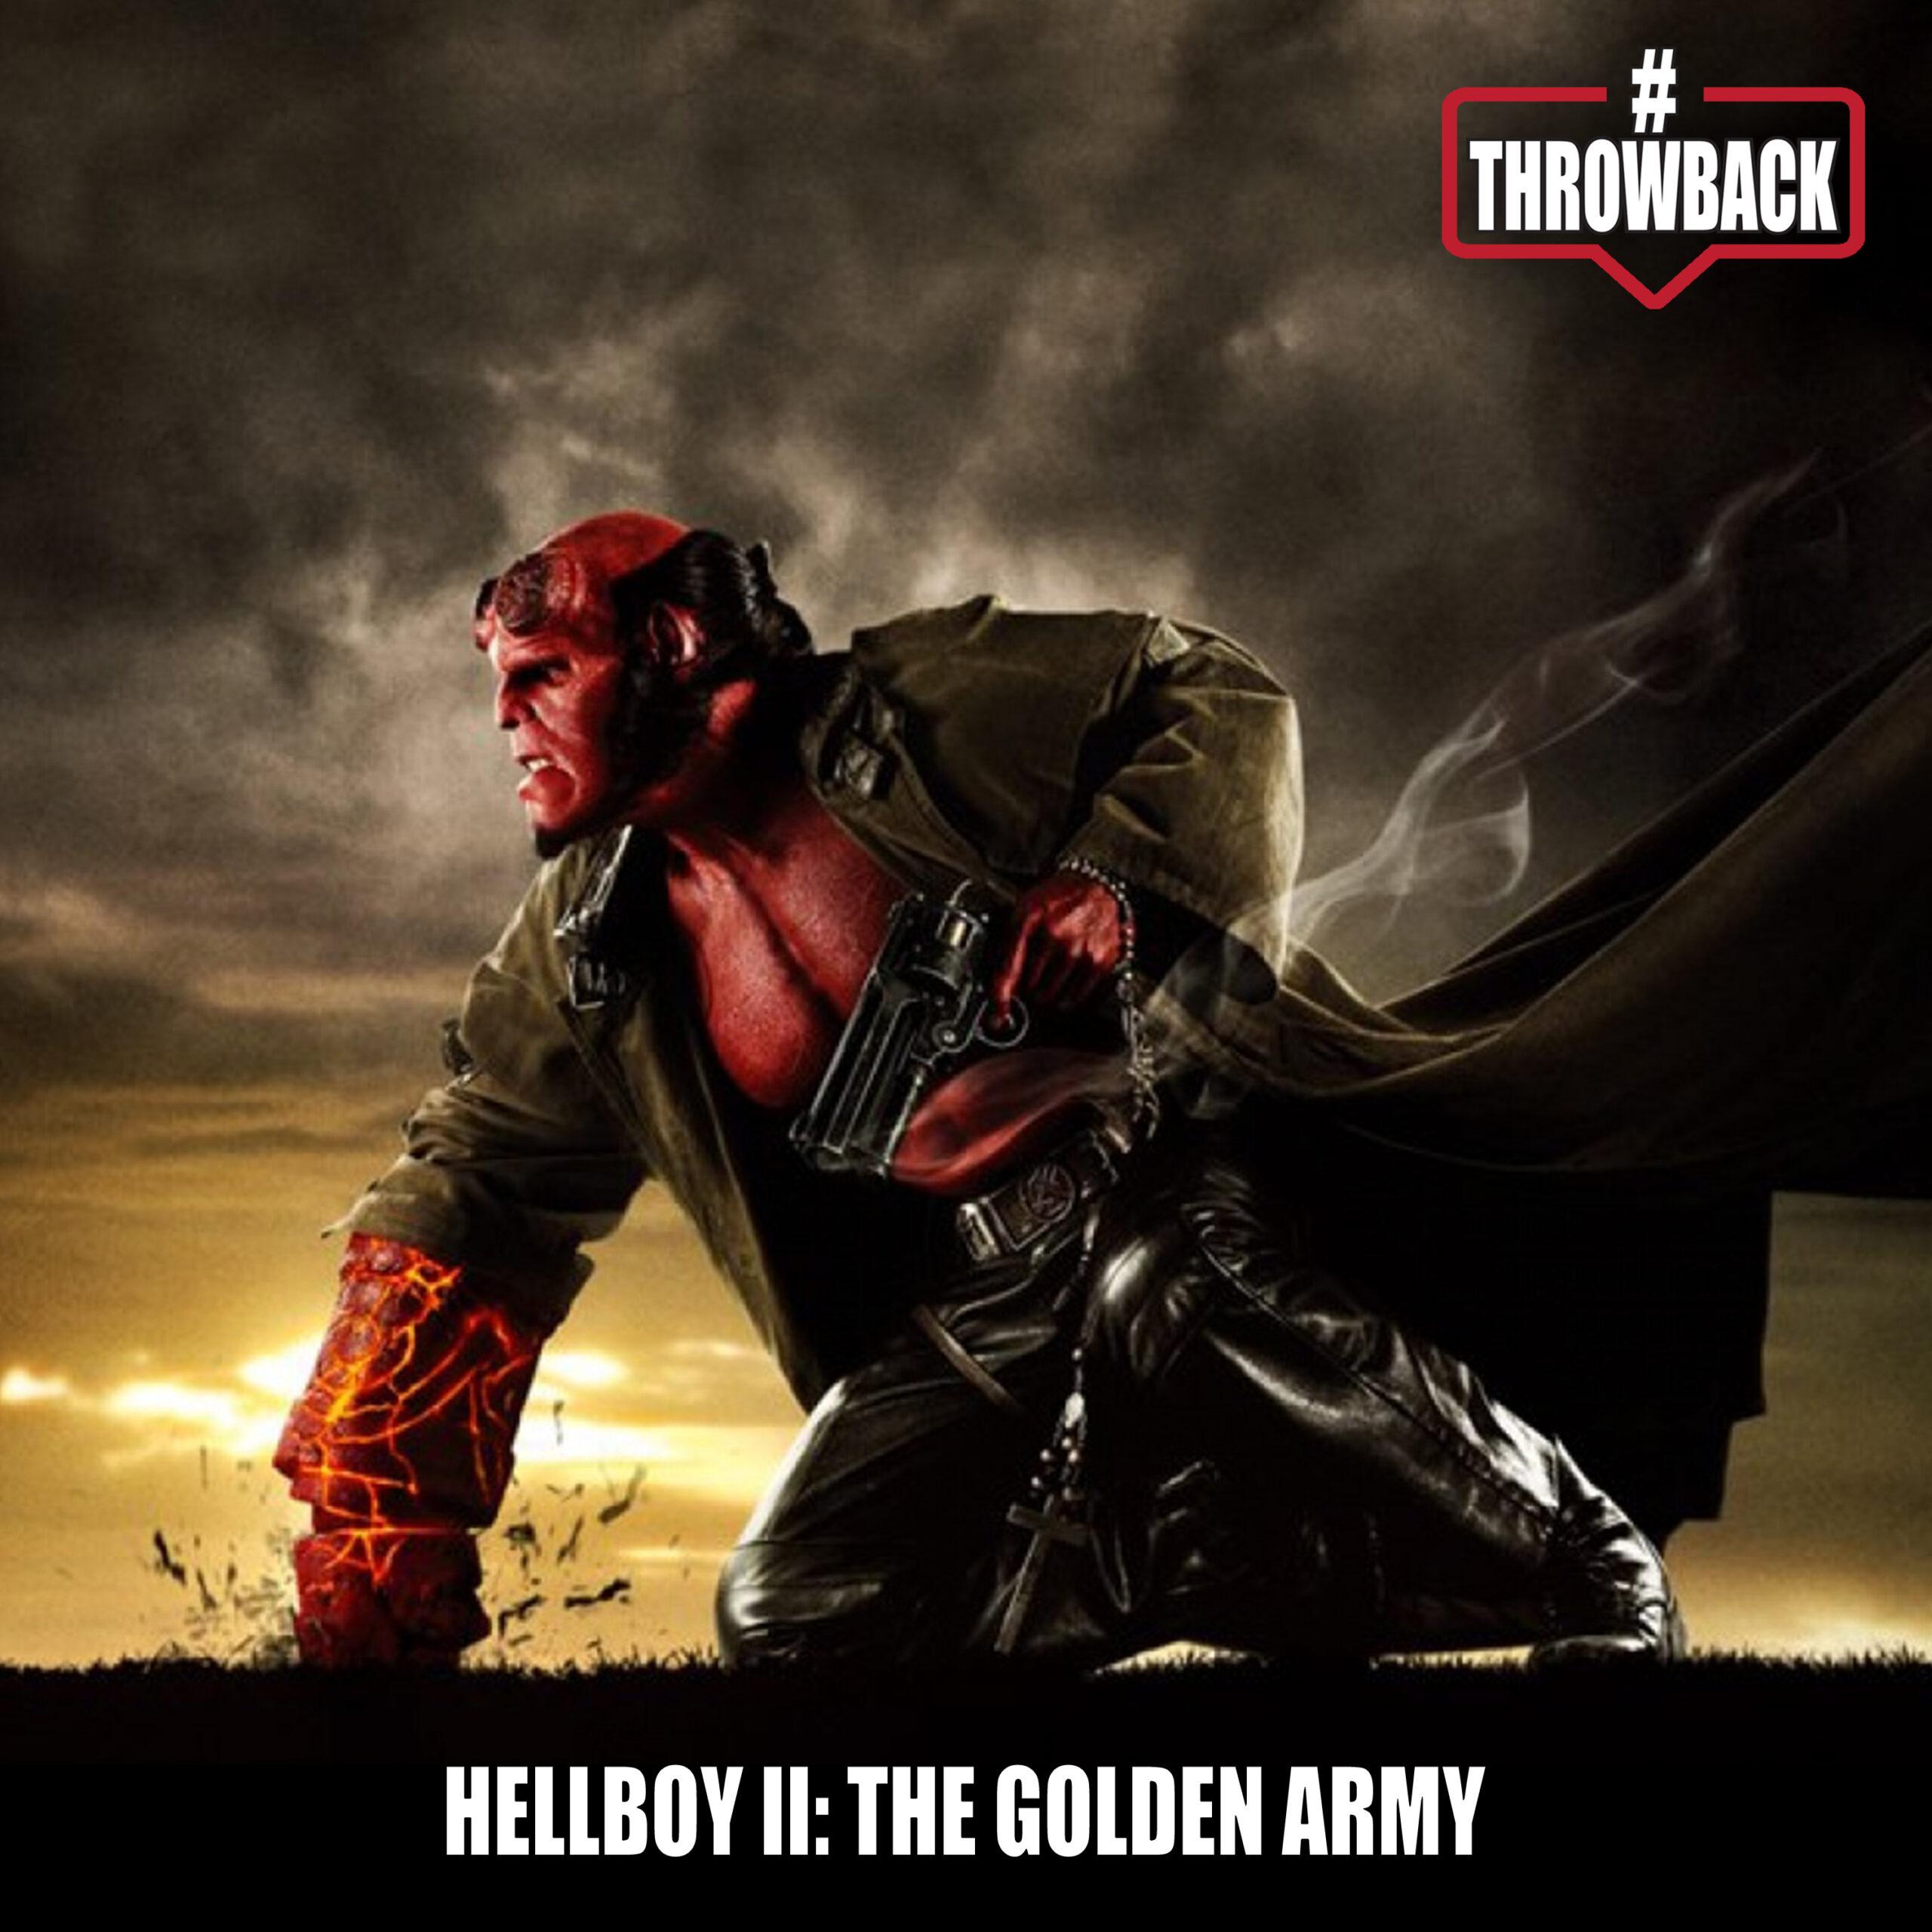 Throwback #63 – Hellboy II: The Golden Army